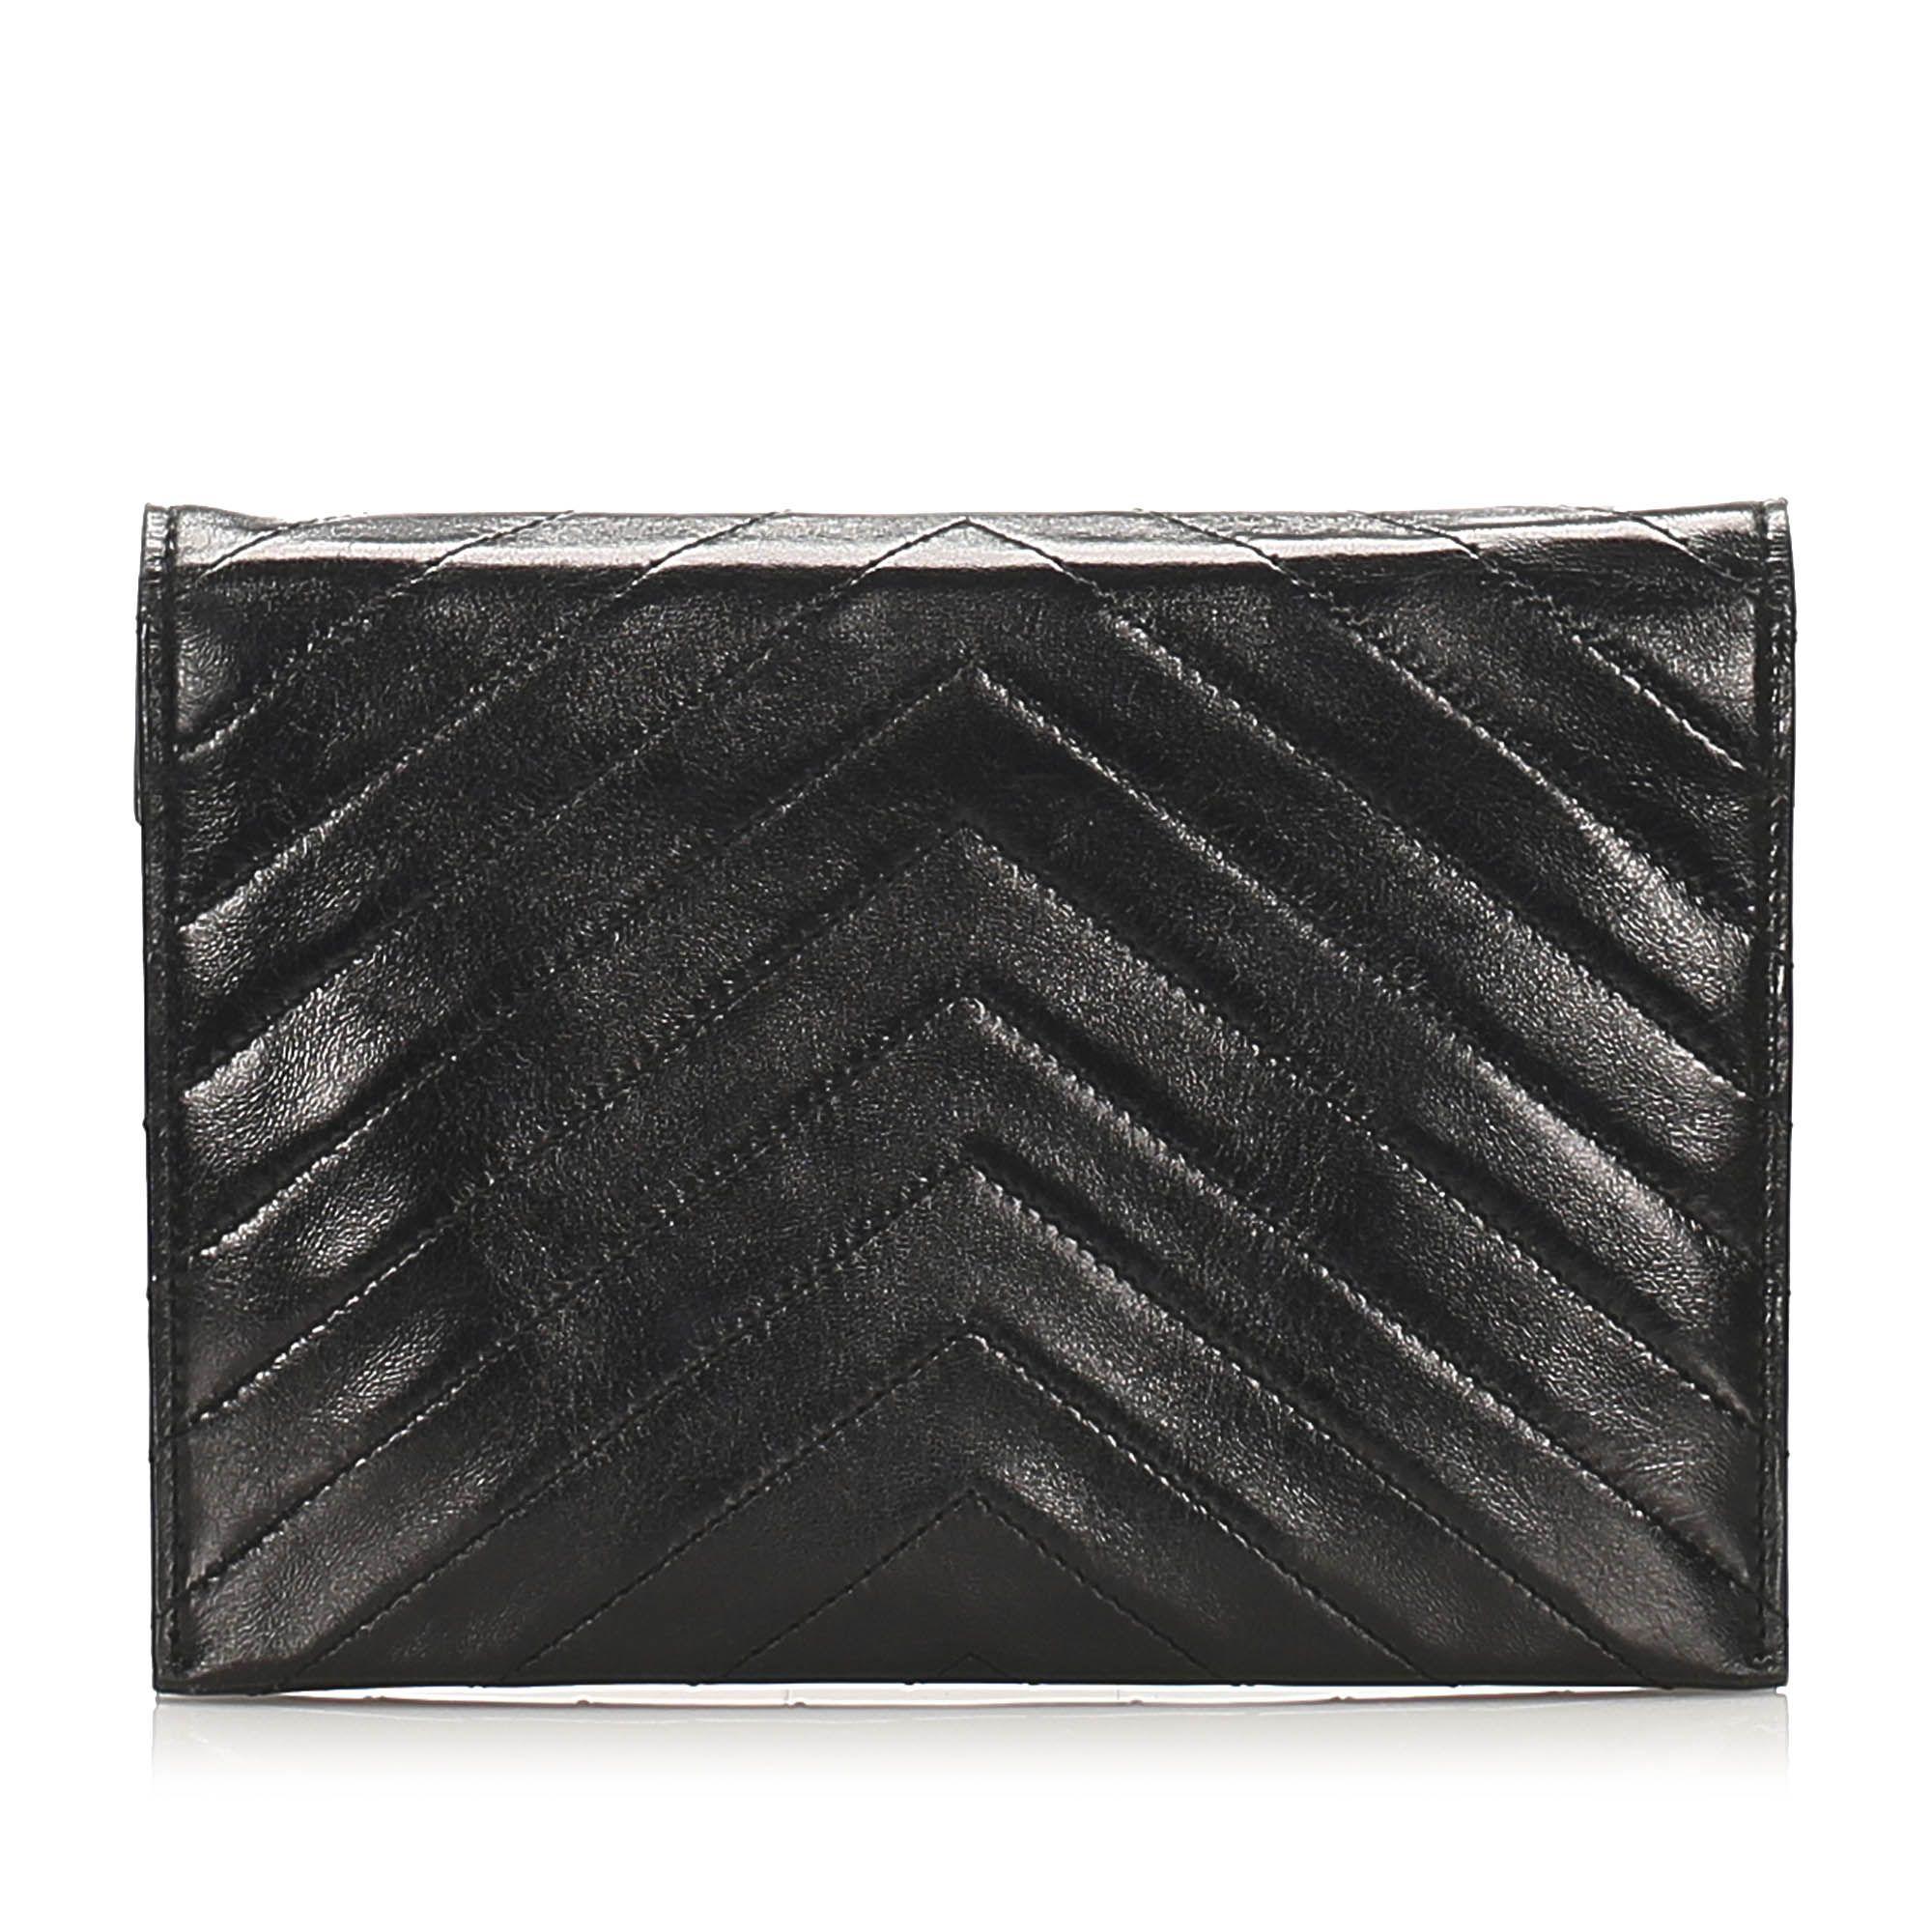 Vintage YSL Chevron Leather Clutch Bag Black